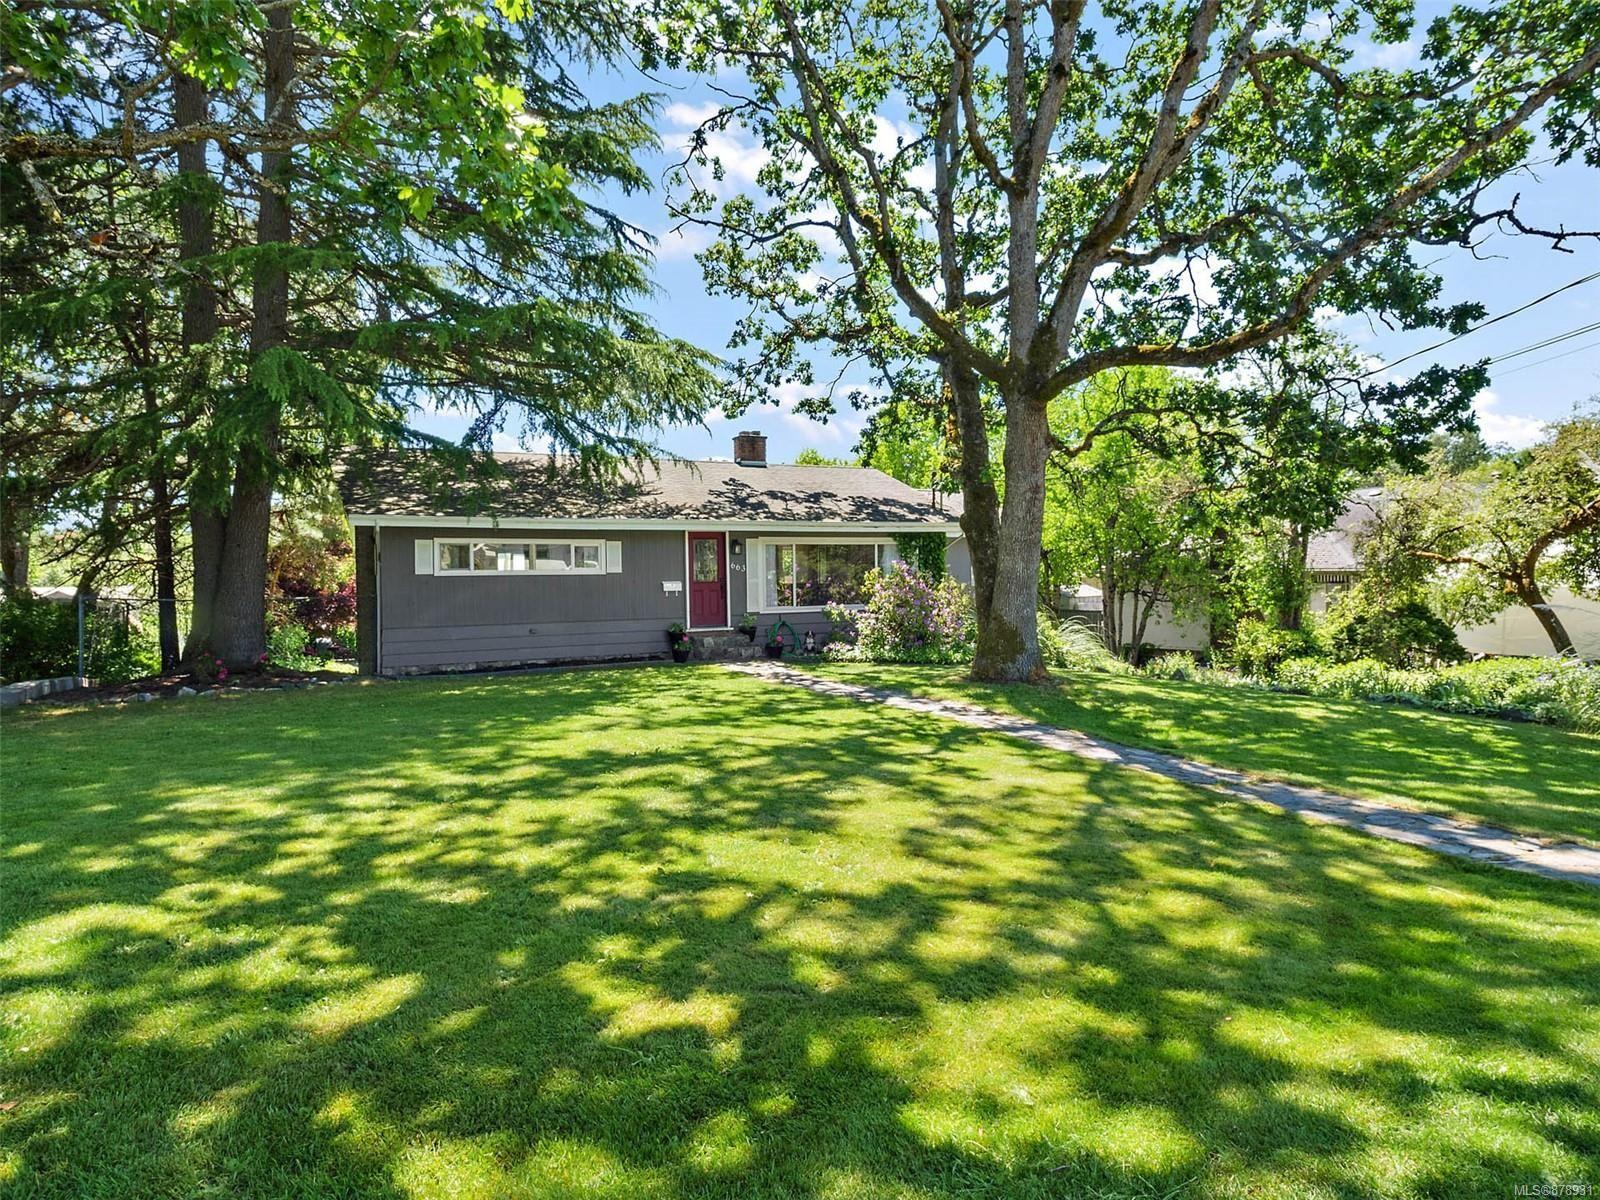 Main Photo: 663 Kent Rd in : SW Tillicum House for sale (Saanich West)  : MLS®# 878931